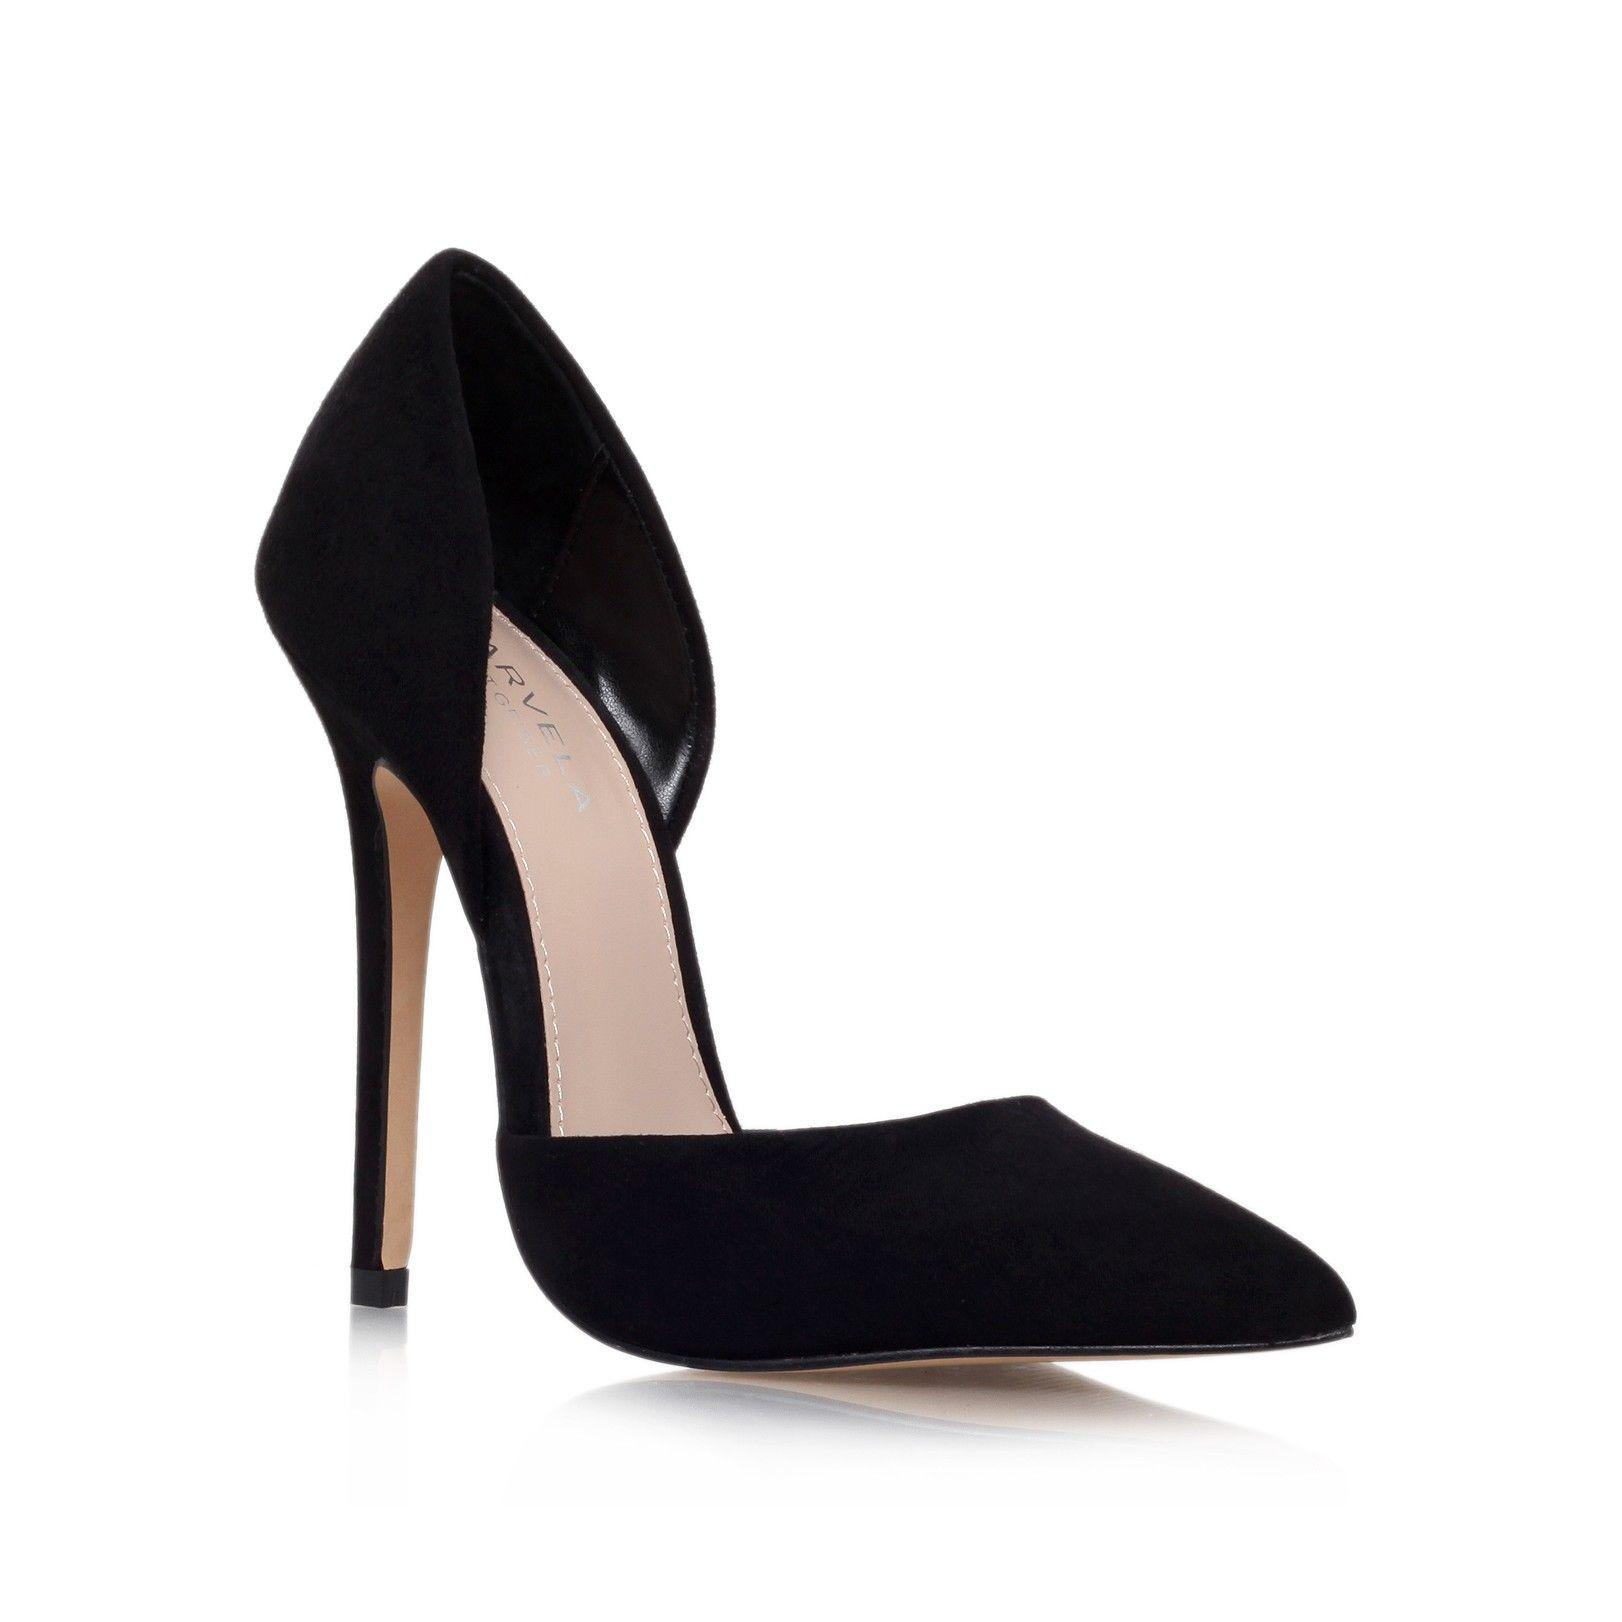 68551f0b76c albert black high heel court shoes from Carvela Kurt Geiger | style ...